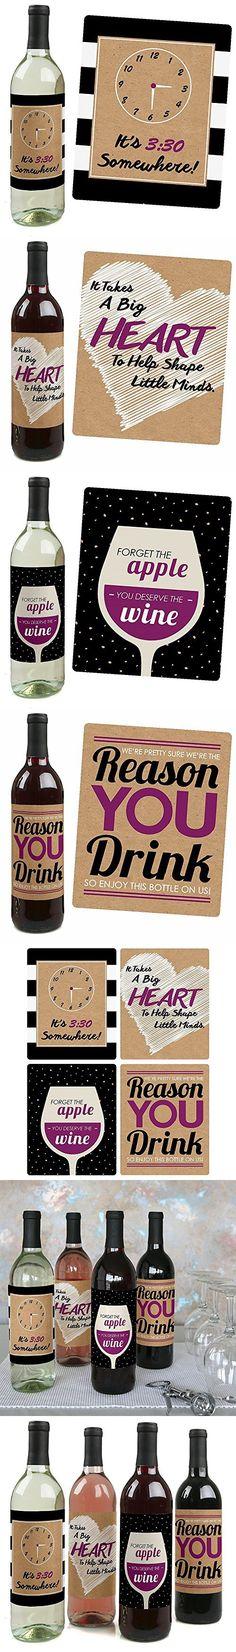 Teacher Appreciation - Teacher Christmas Gift - Wine Bottle Labels - Set of 4